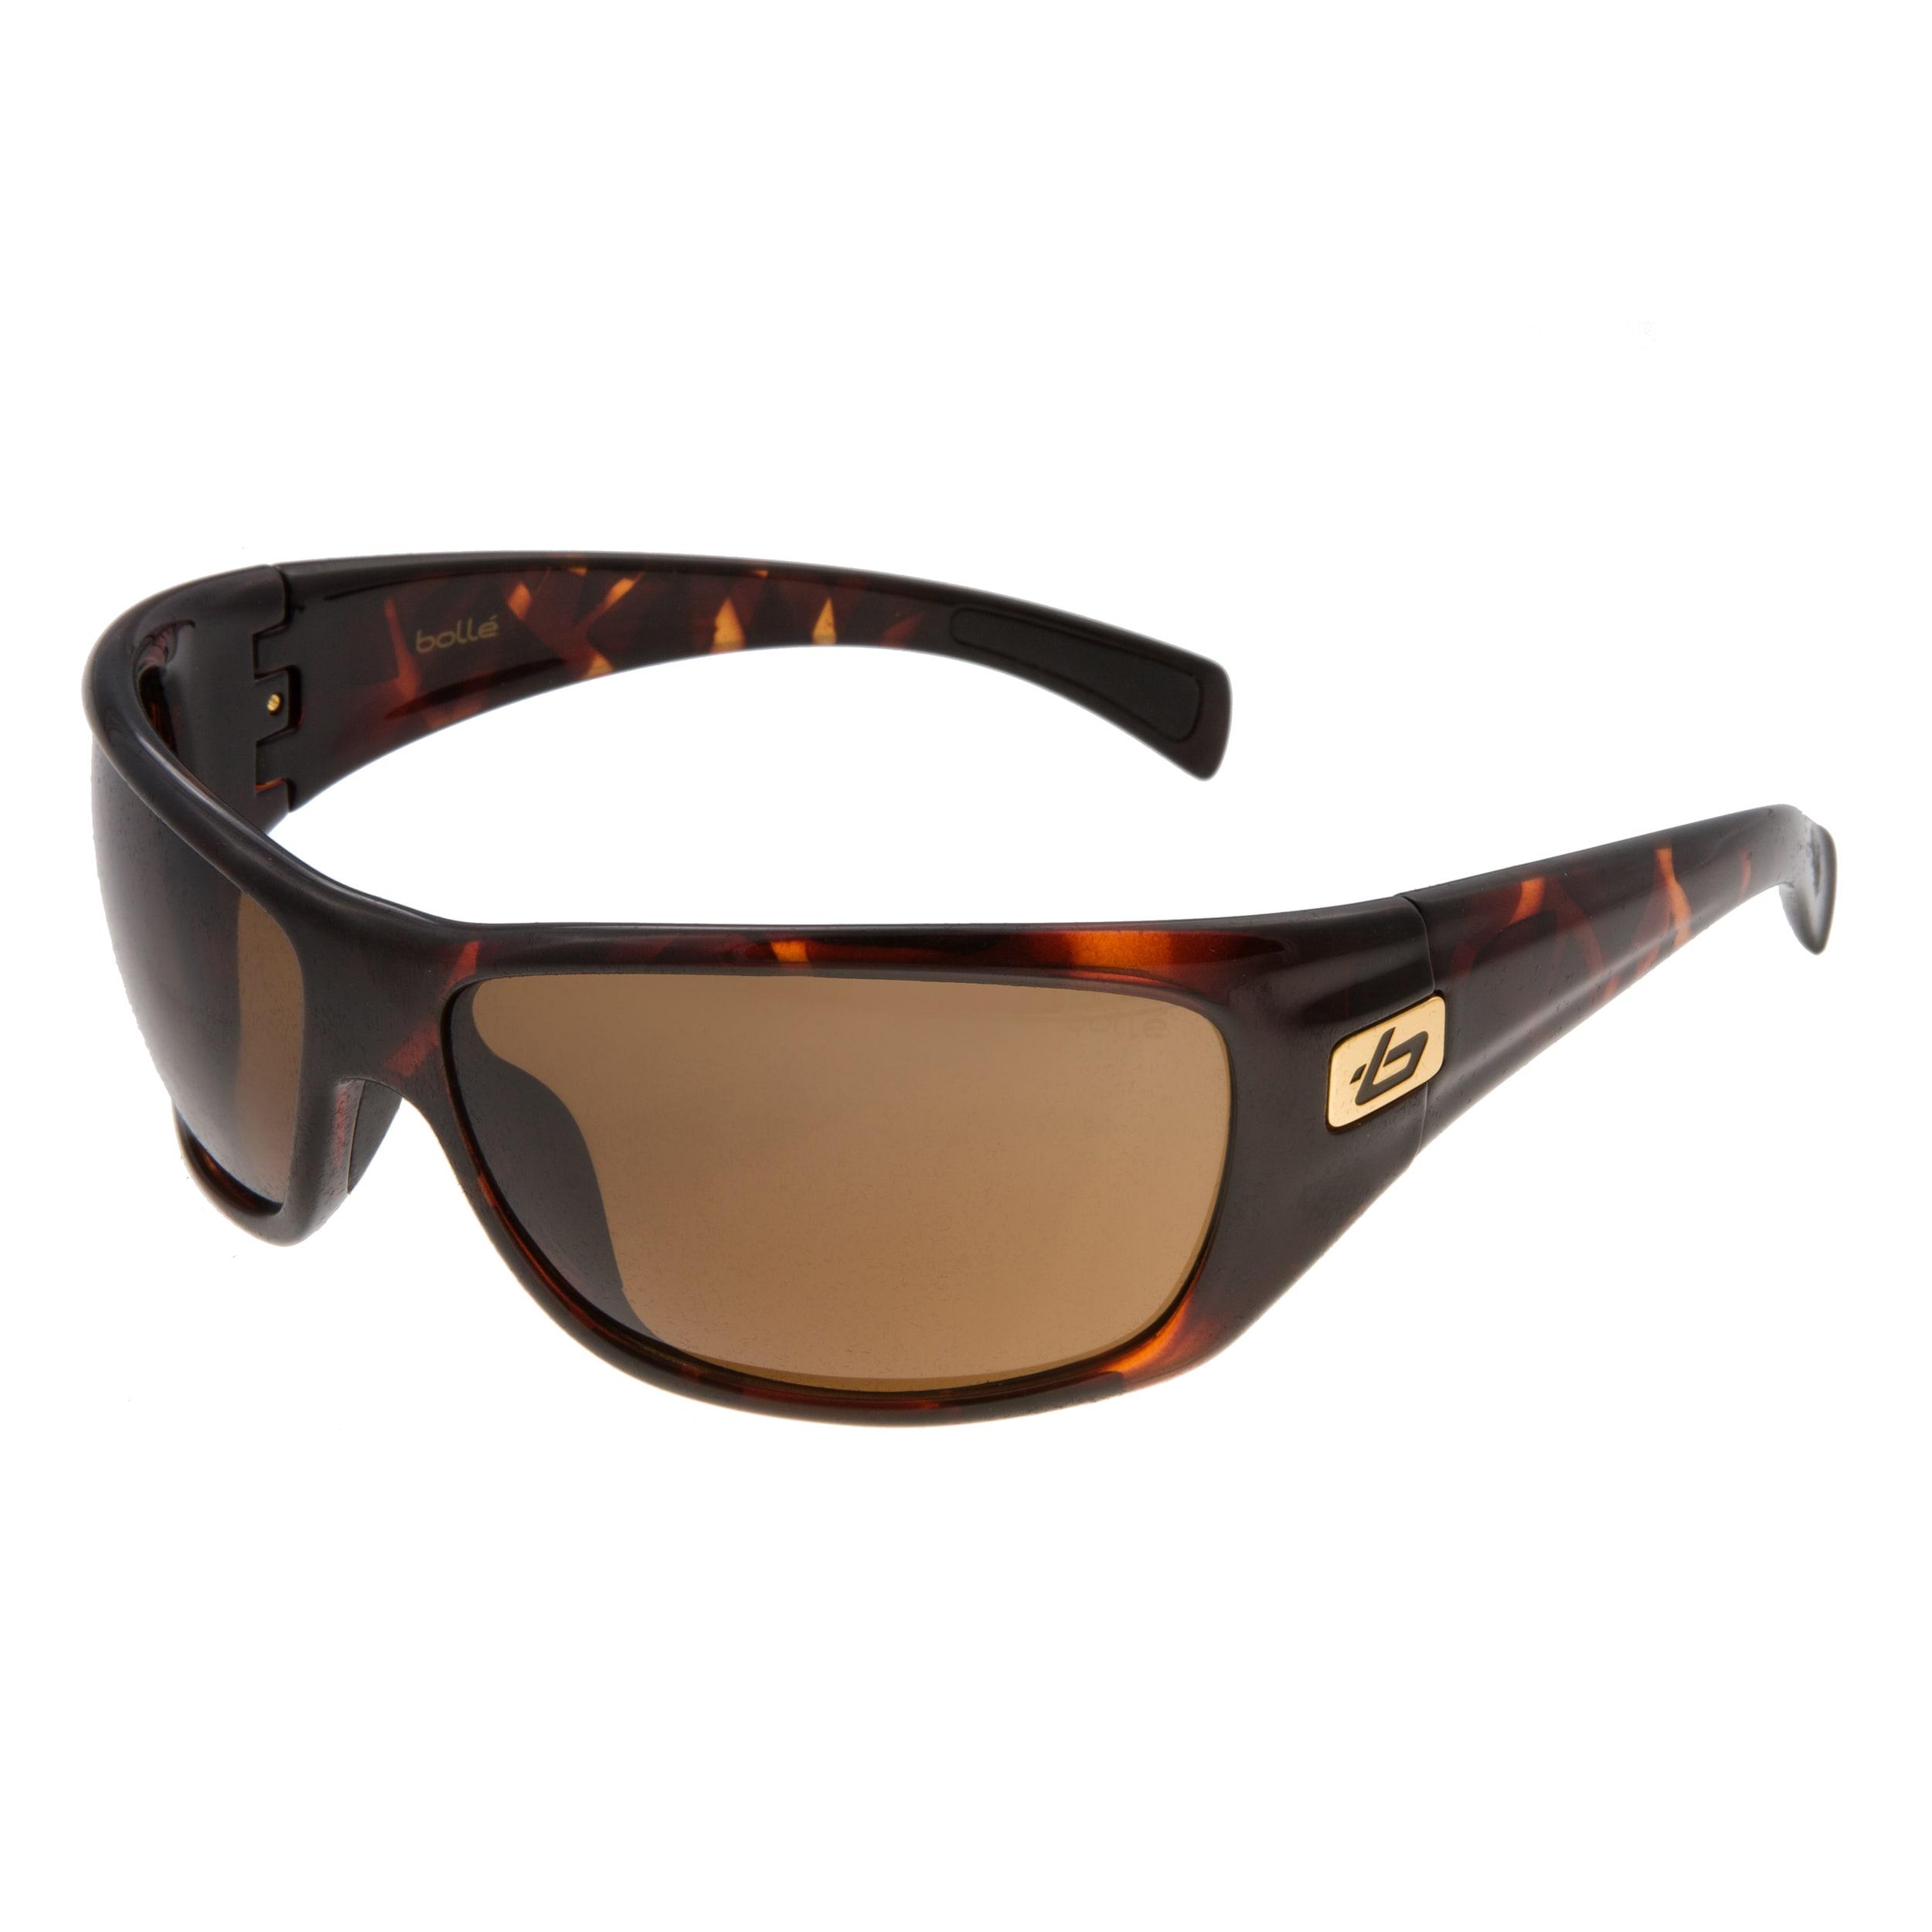 8c4328d9ac Bolle Mens Cobra Dark Tortoise Sunglasses (Dark tortoiseStyle SportModel  11223Frame PlasticLens Scratch  impact resistant